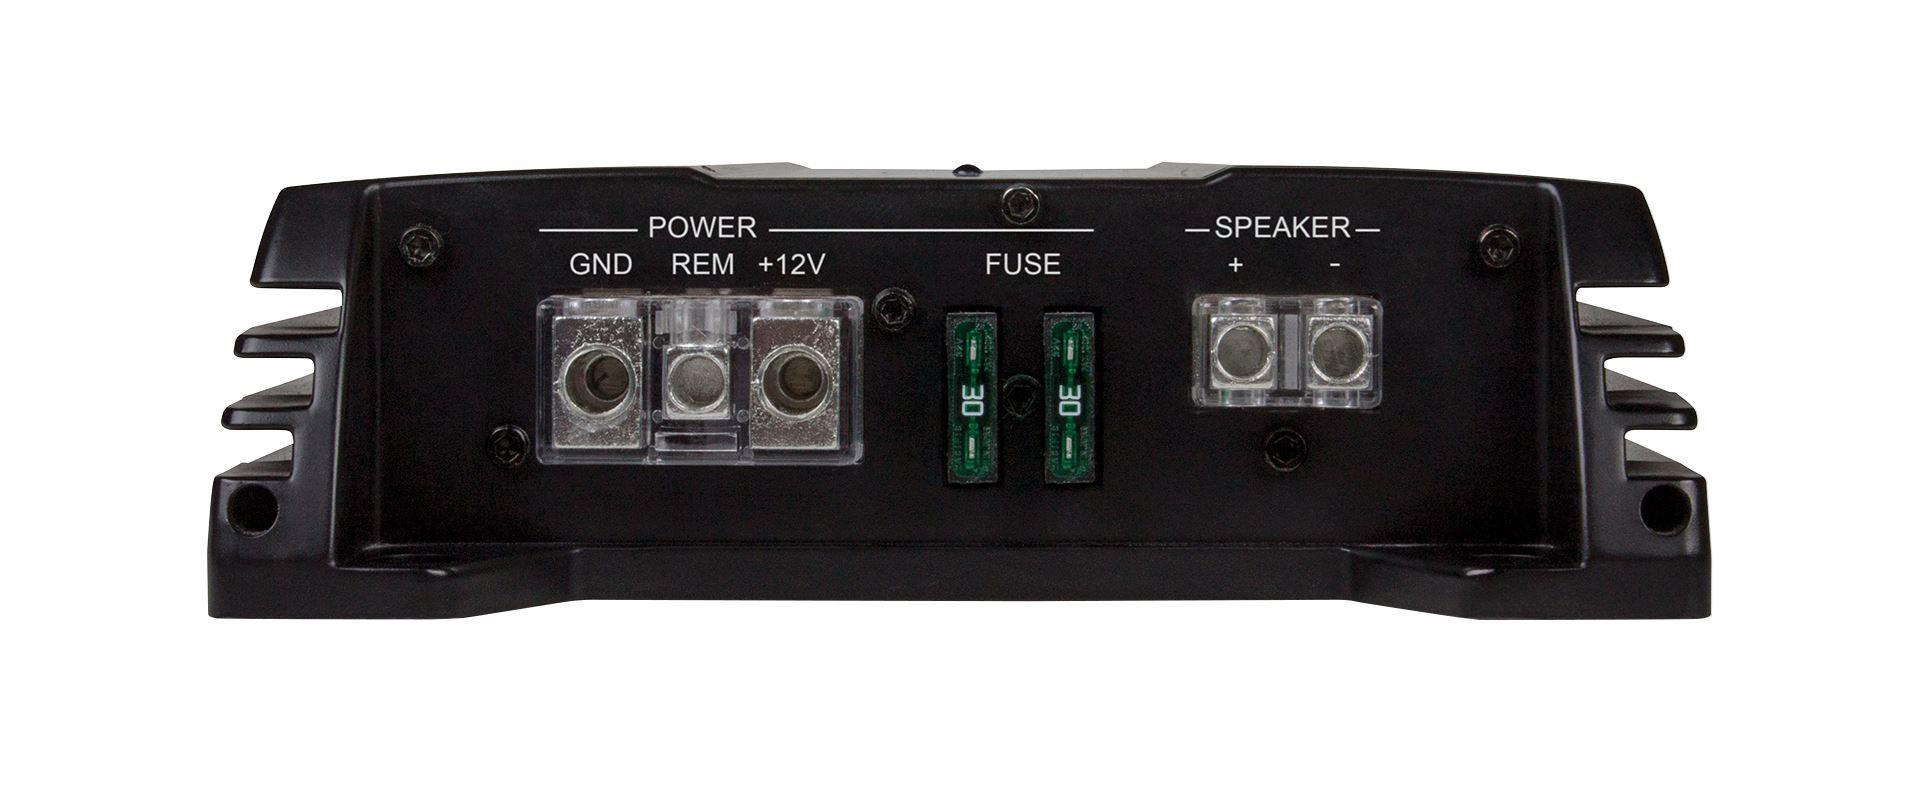 tnp212d2 dual 12 subwoofer enclosure and amplifier party package rh mtx com Termiator MTX mtx tna251 amp manual